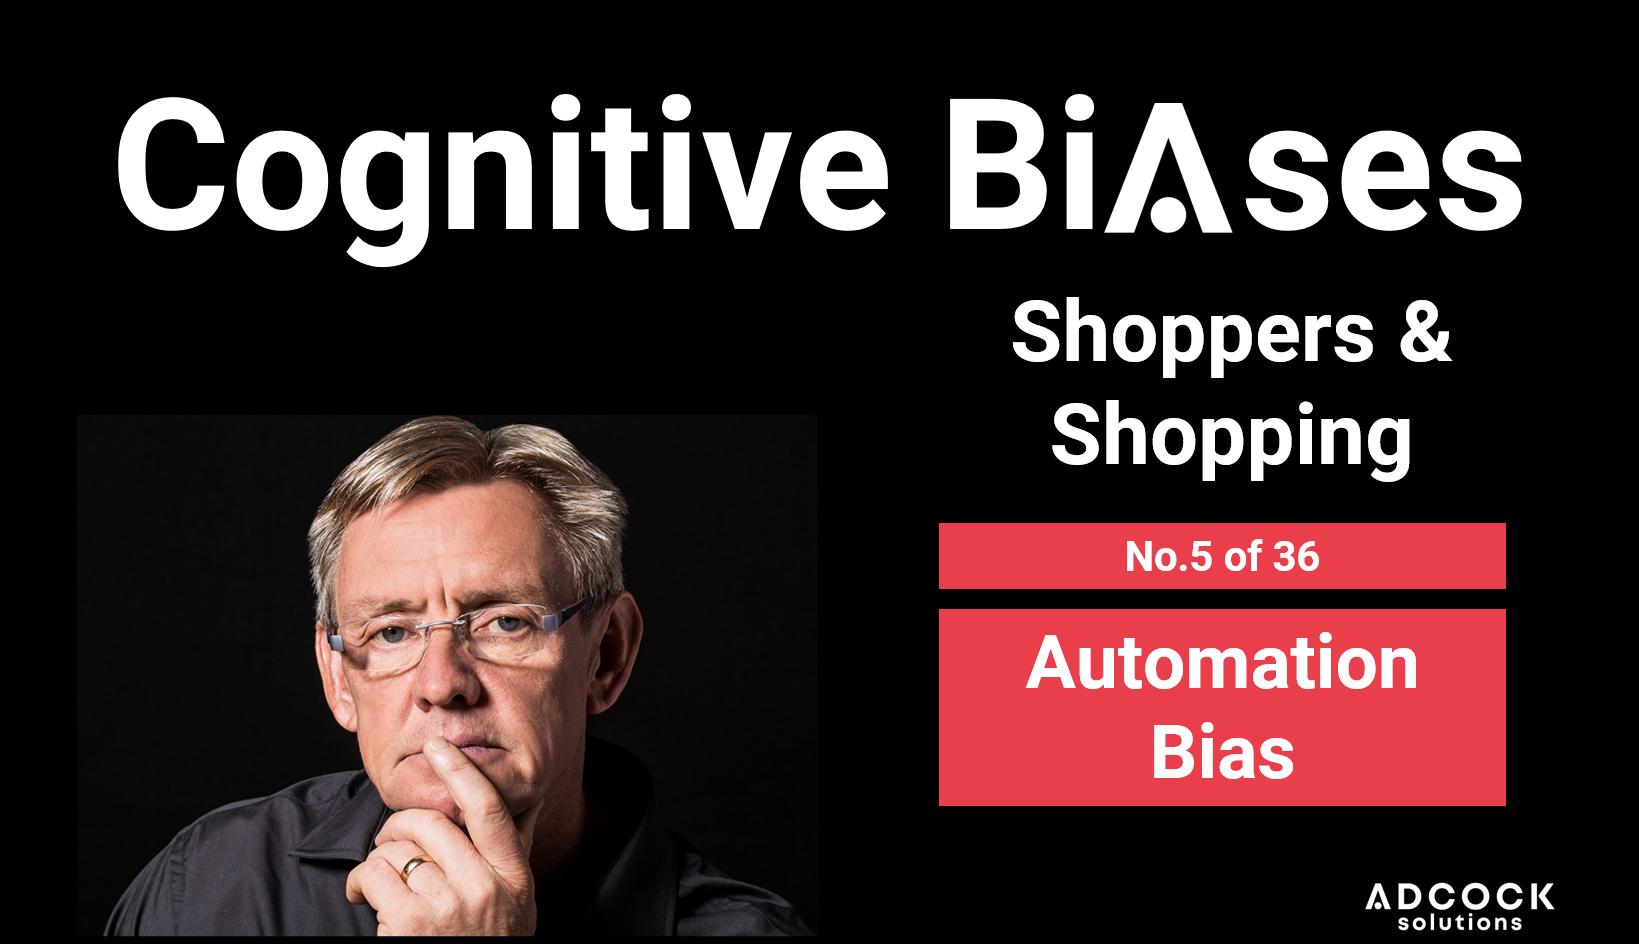 No.5 of 36 Automation Bias